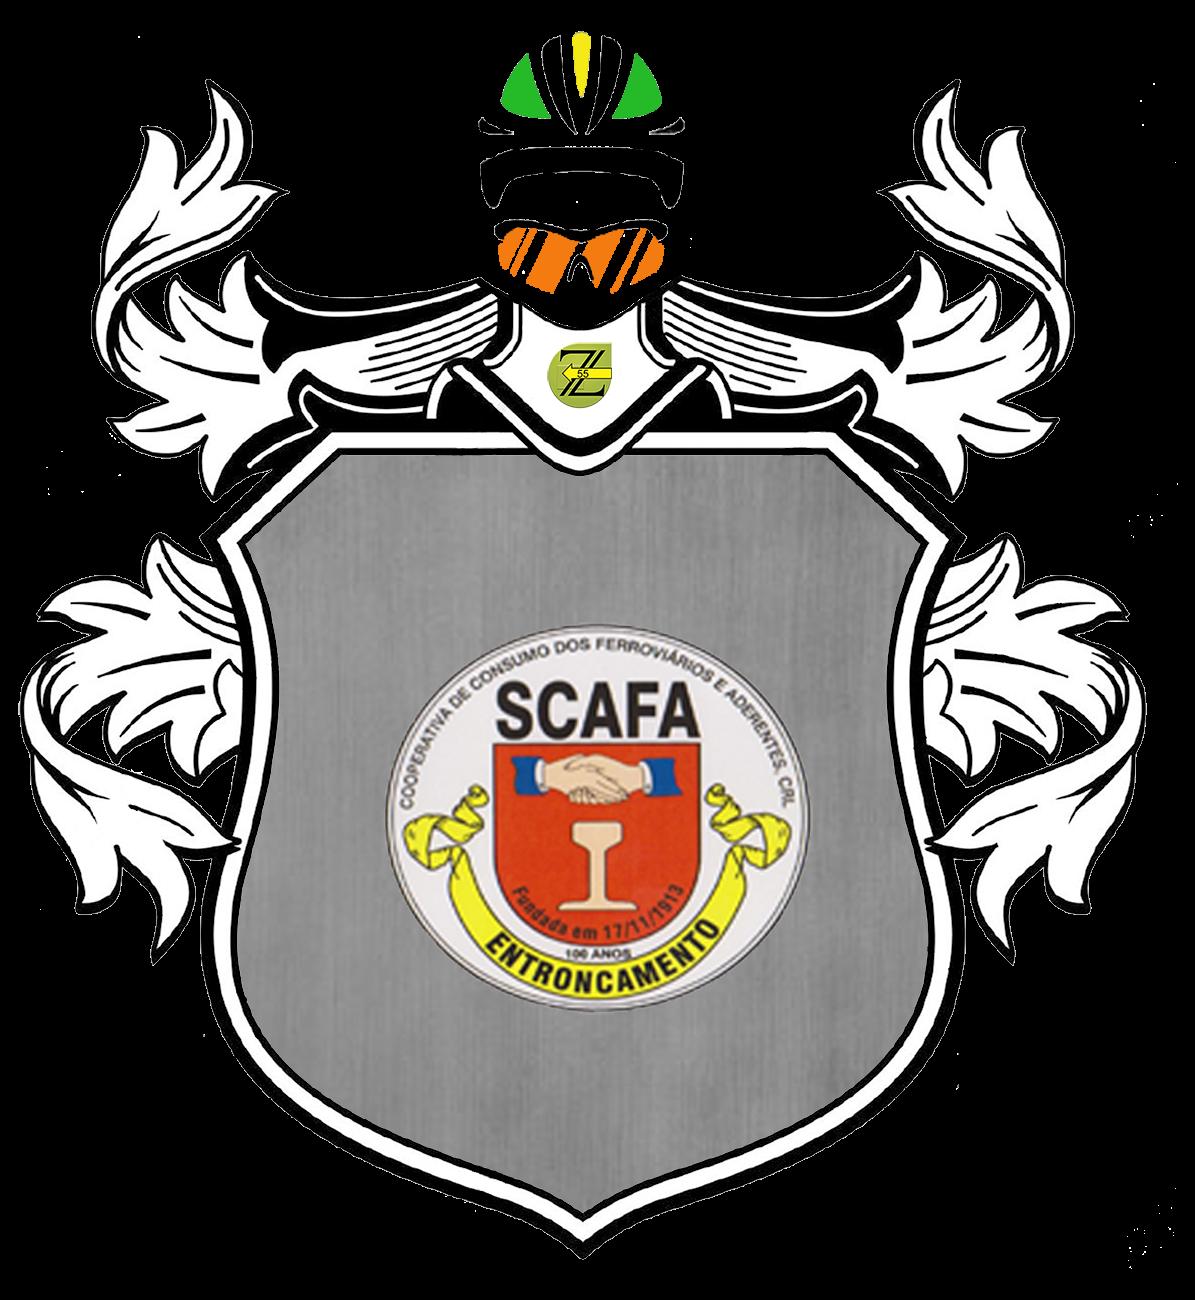 S.C.A.F.A.